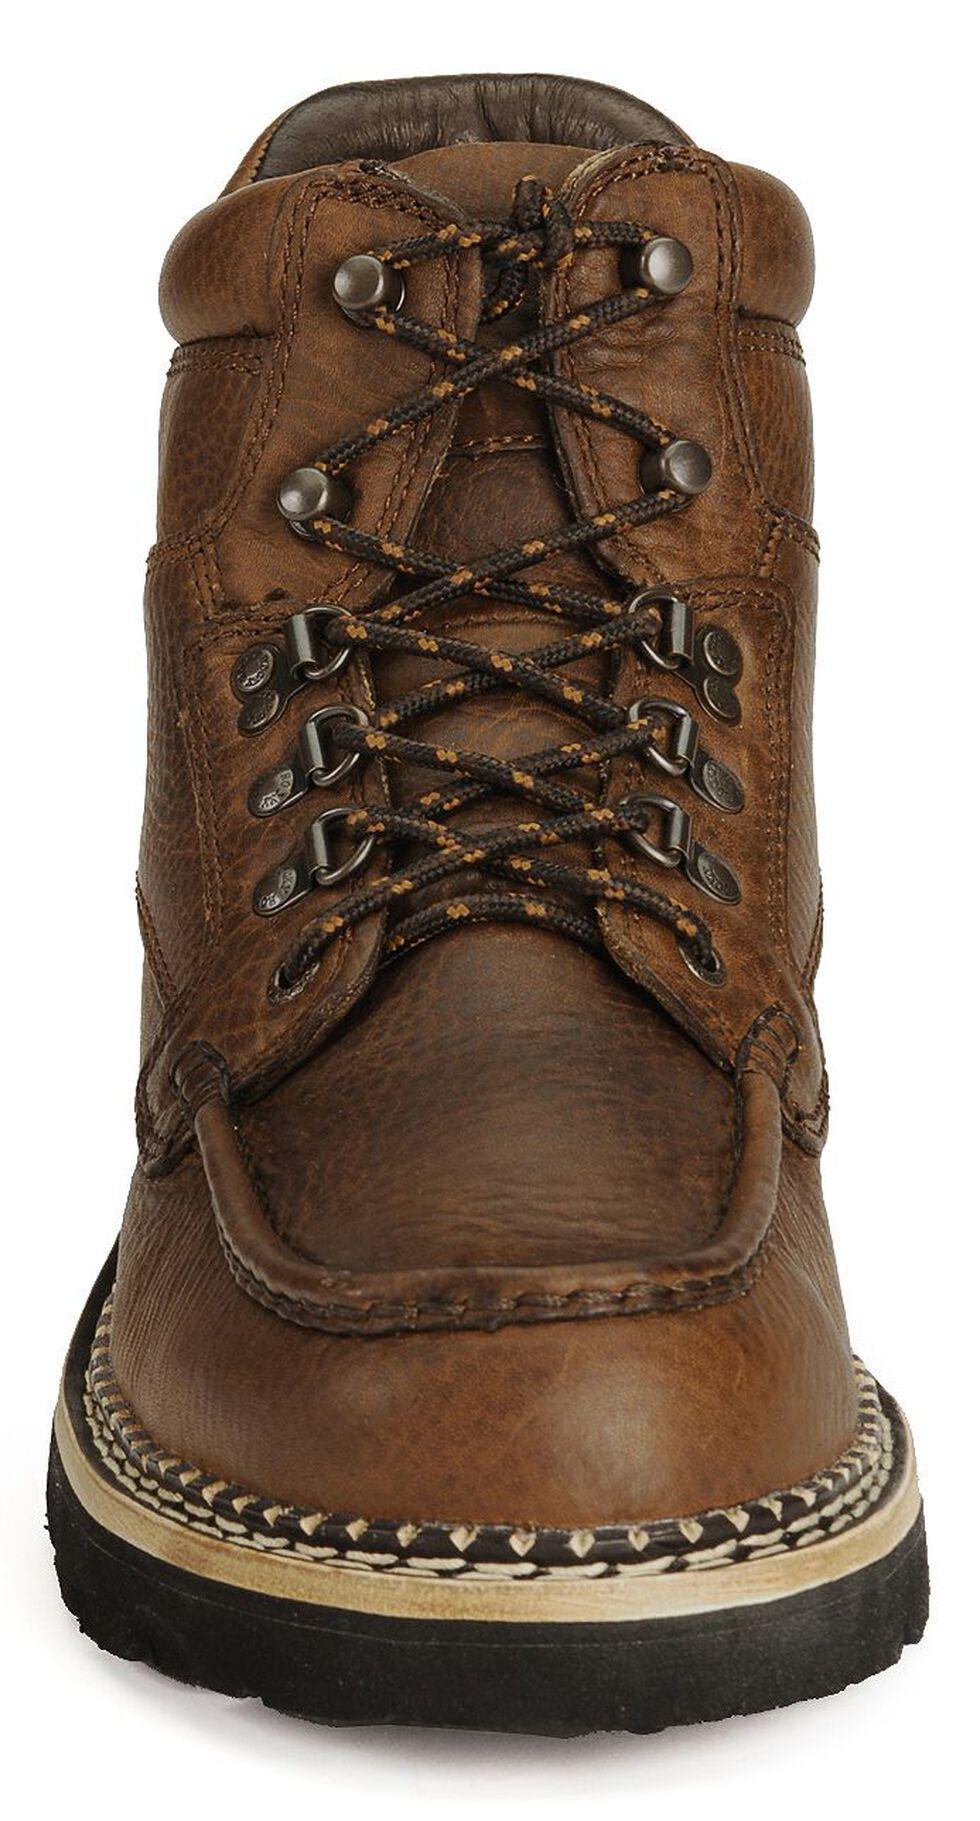 Rocky Men's Western Cruiser Chukka Casual Boots, Dark Brown, hi-res